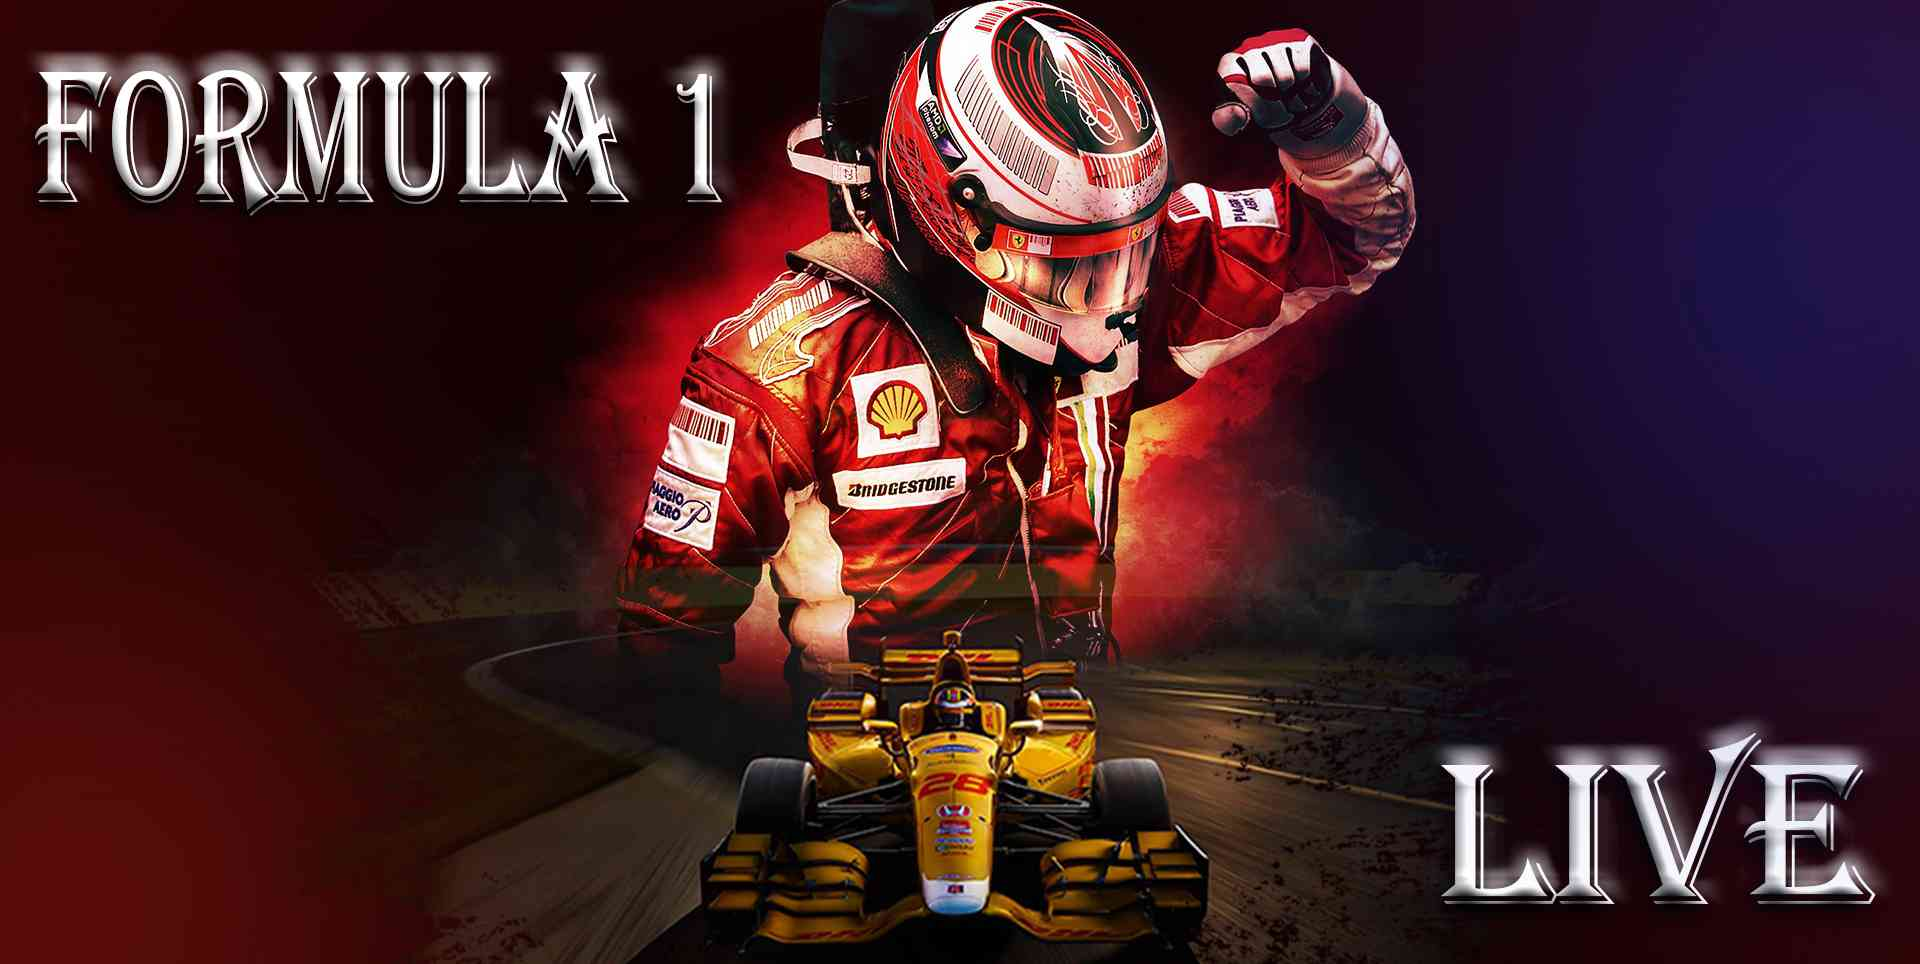 live-chinese-formula-1-grand-prix-2015-online